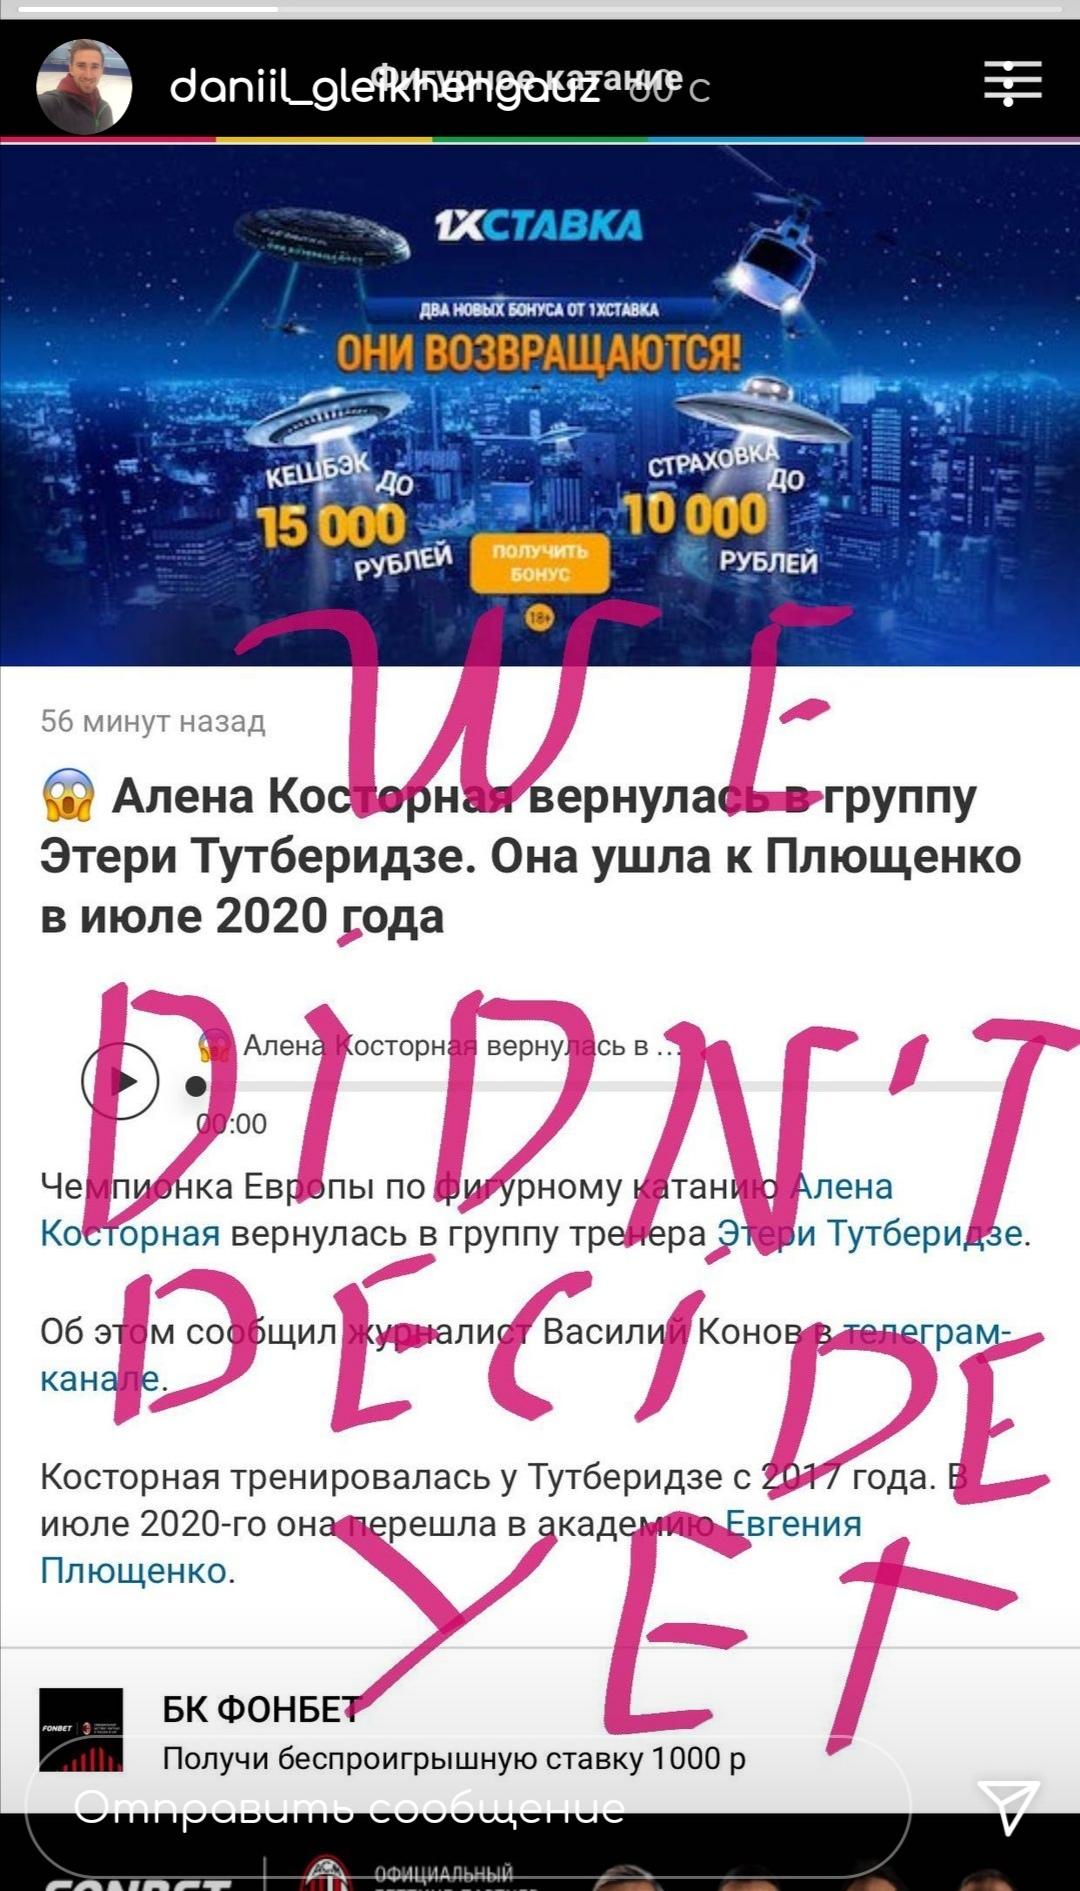 https://i1.imageban.ru/out/2021/03/04/605d5f93548c95e8fa0215e13823ffb7.jpg